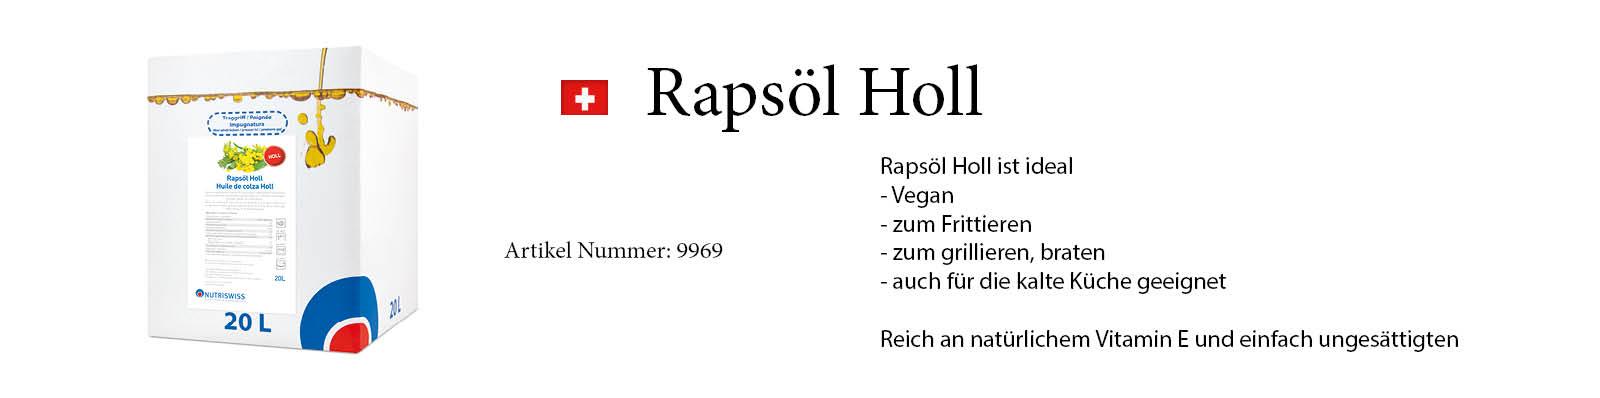 Rapsl_Aug